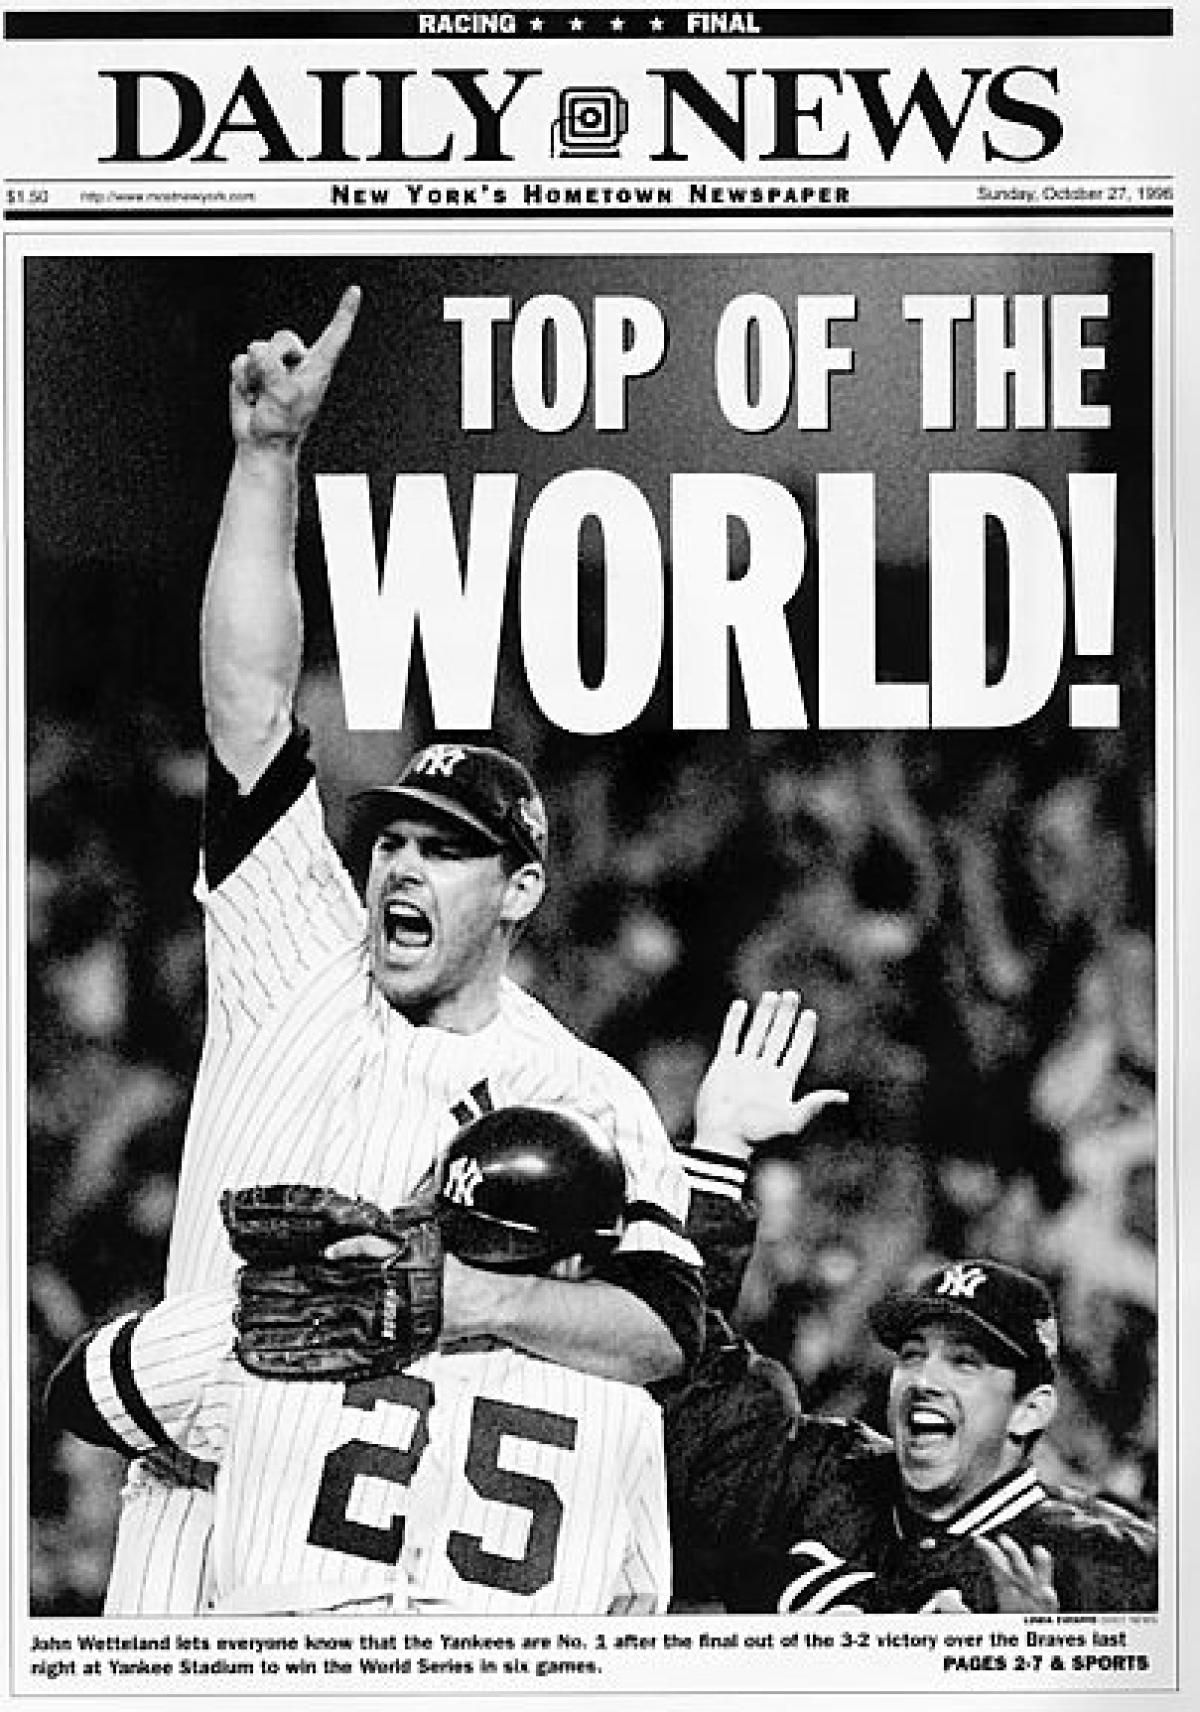 27 Yankees World Series Titles 27 Daily News Covers Slide 23 Yankees World Series New York Yankees New York Yankees Baseball